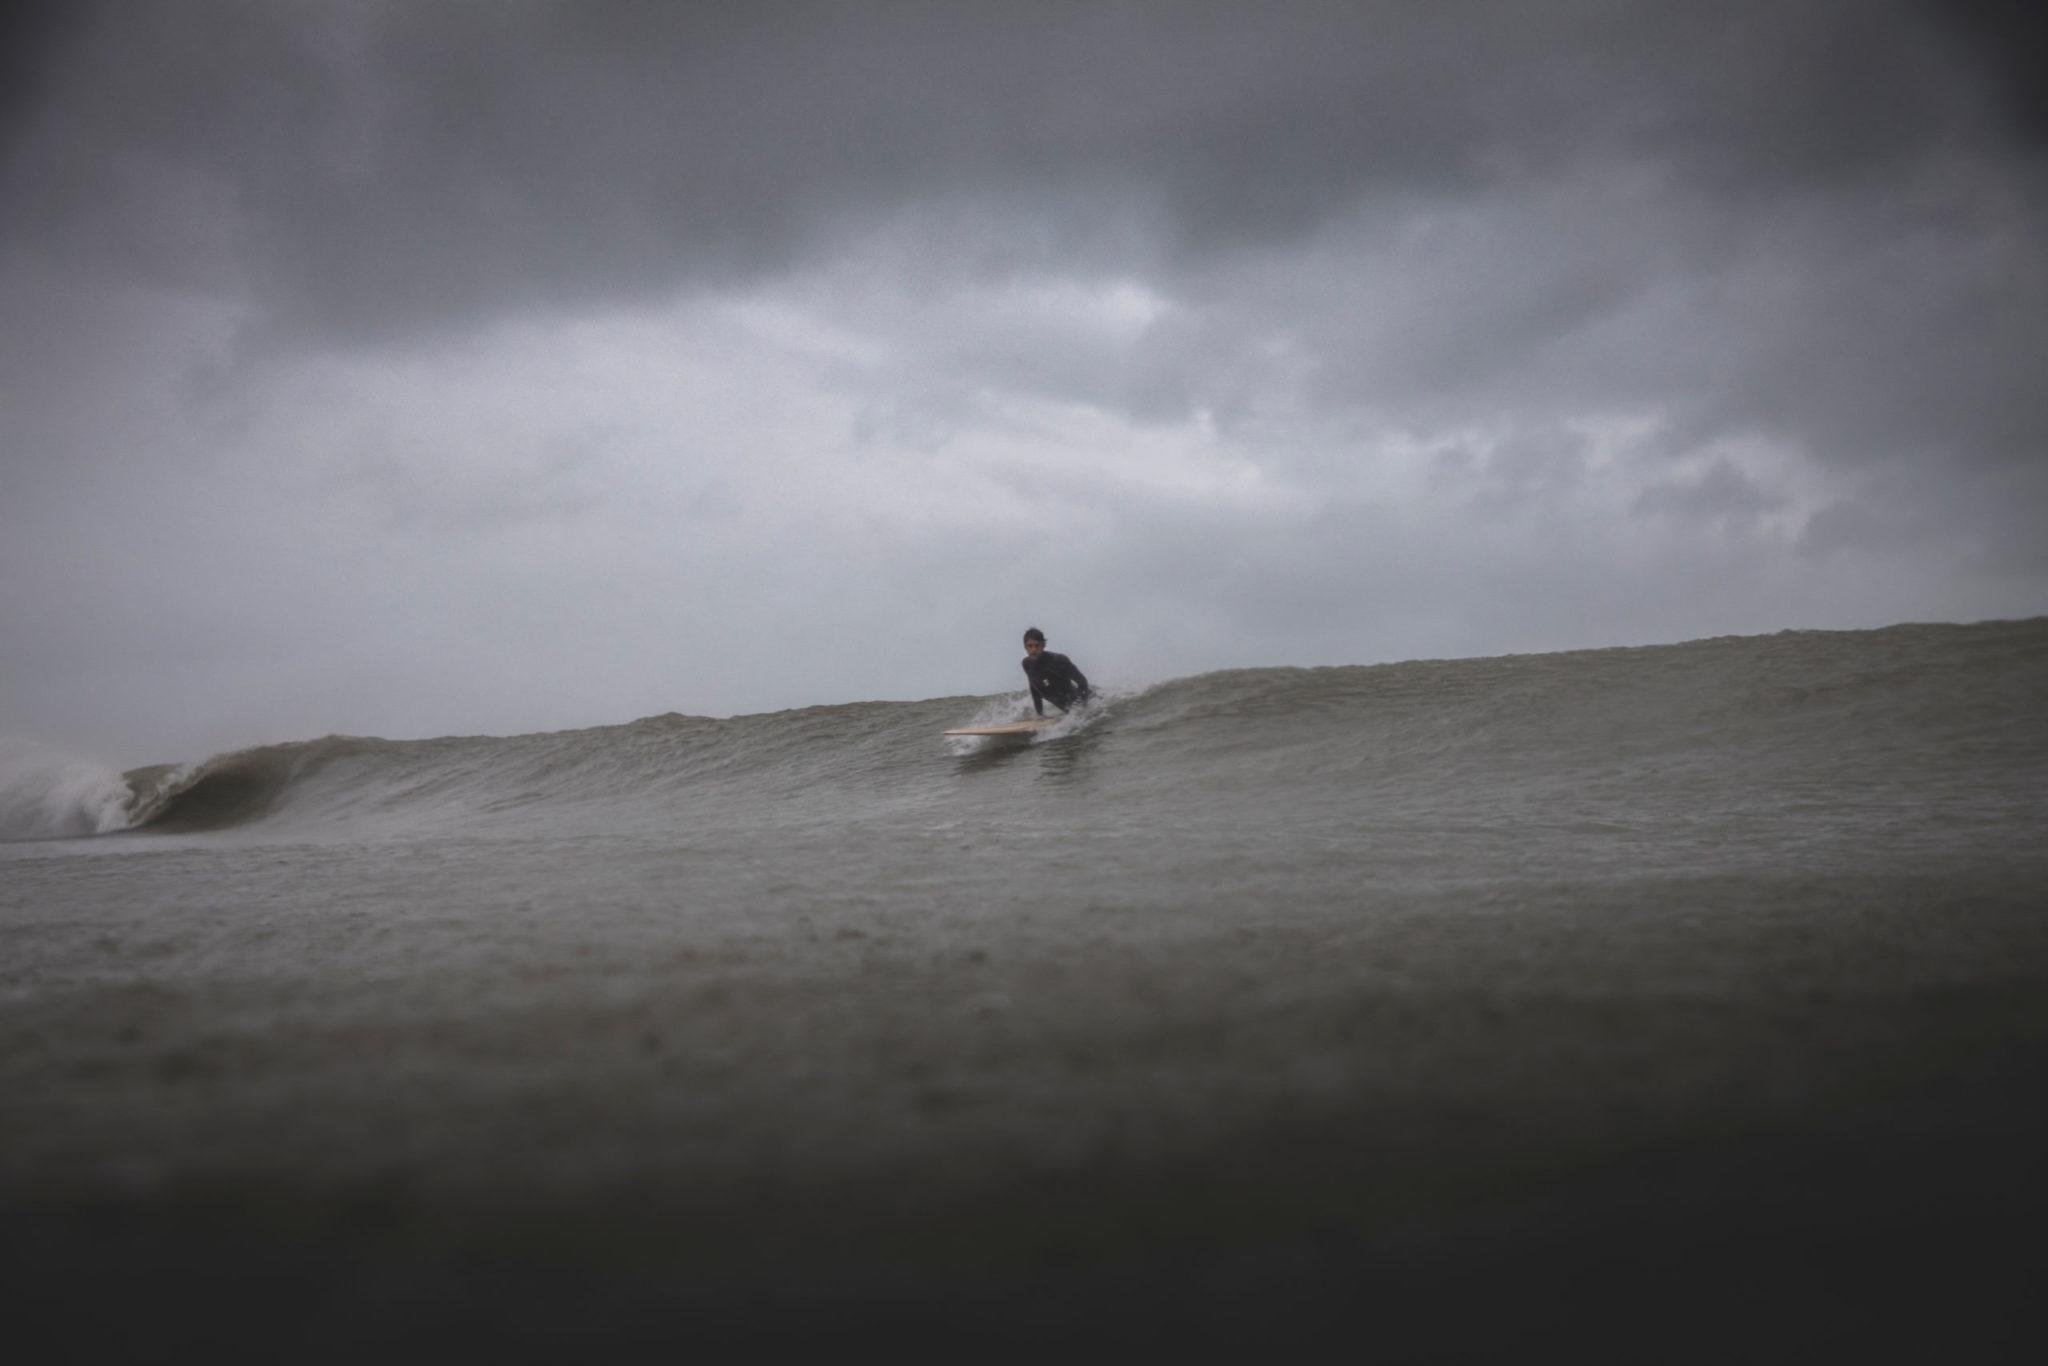 Cachalot Surfboards planche surf handmade artisan shaper hollow wooden lauzin blunt